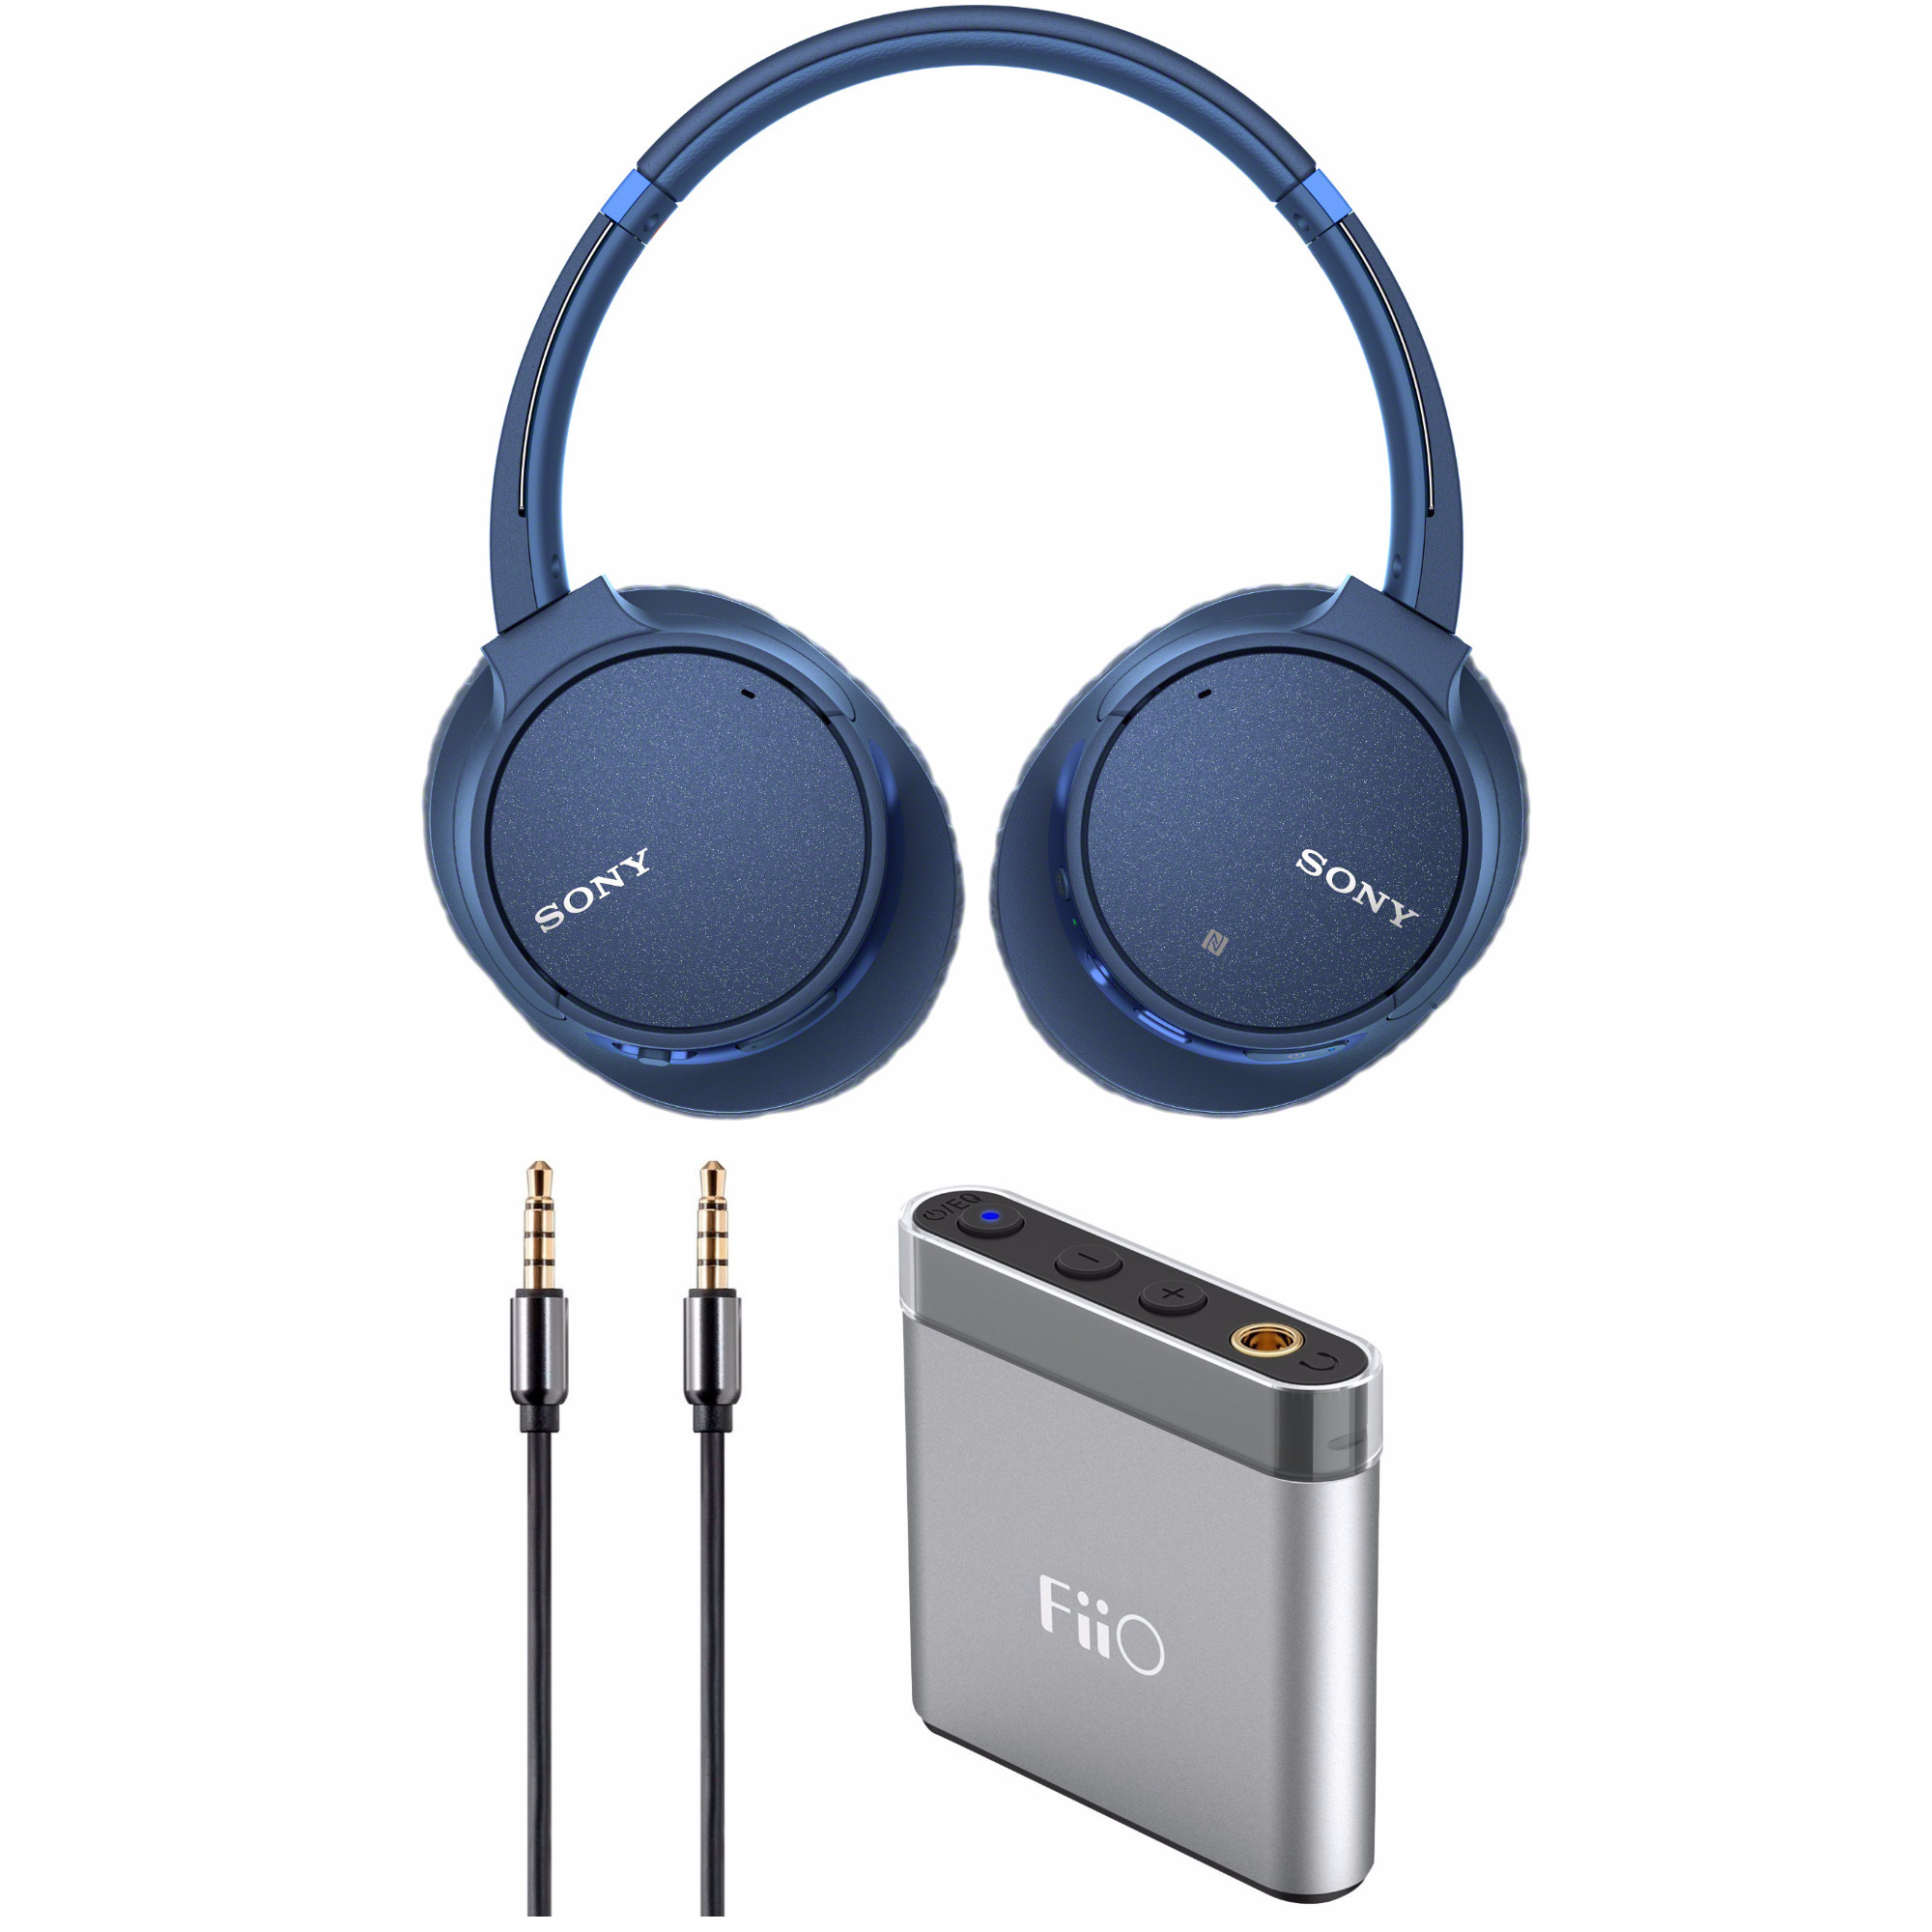 Sony WH-CH700N Wireless Noise Canceling Headphones (Blue) Bundle